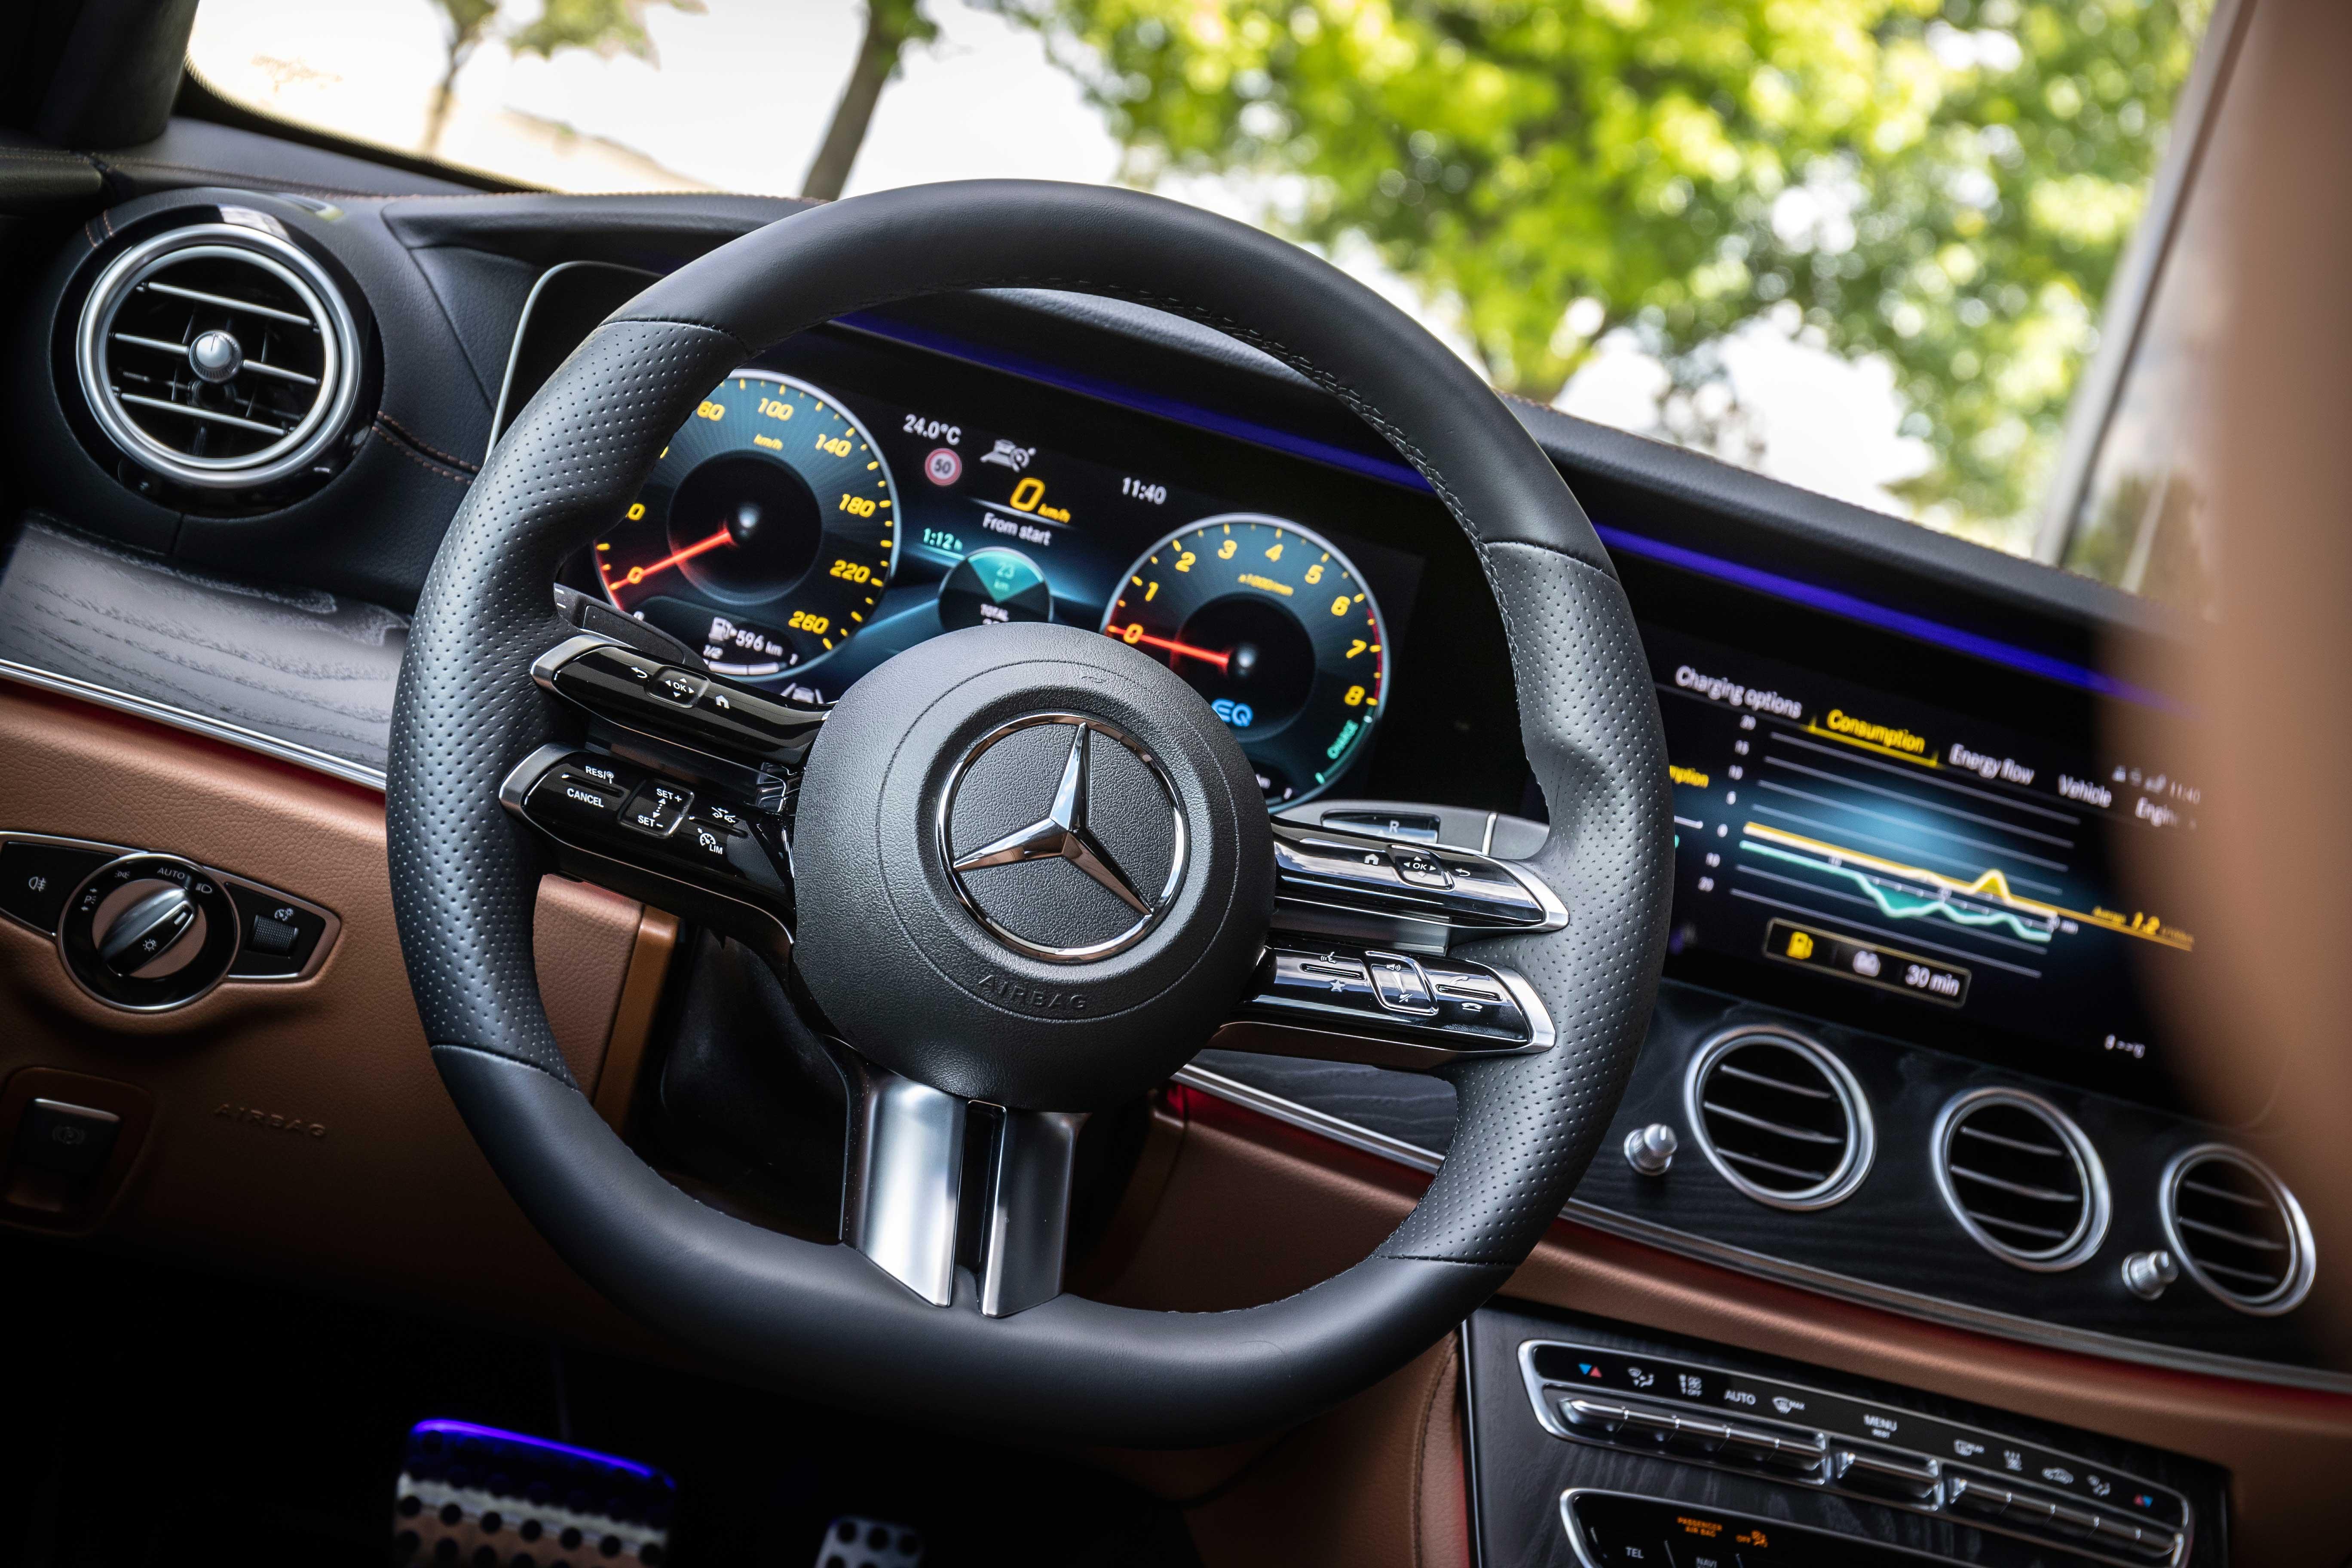 Mercedes E Class Hybrid Interior Comfort Drivingelectric